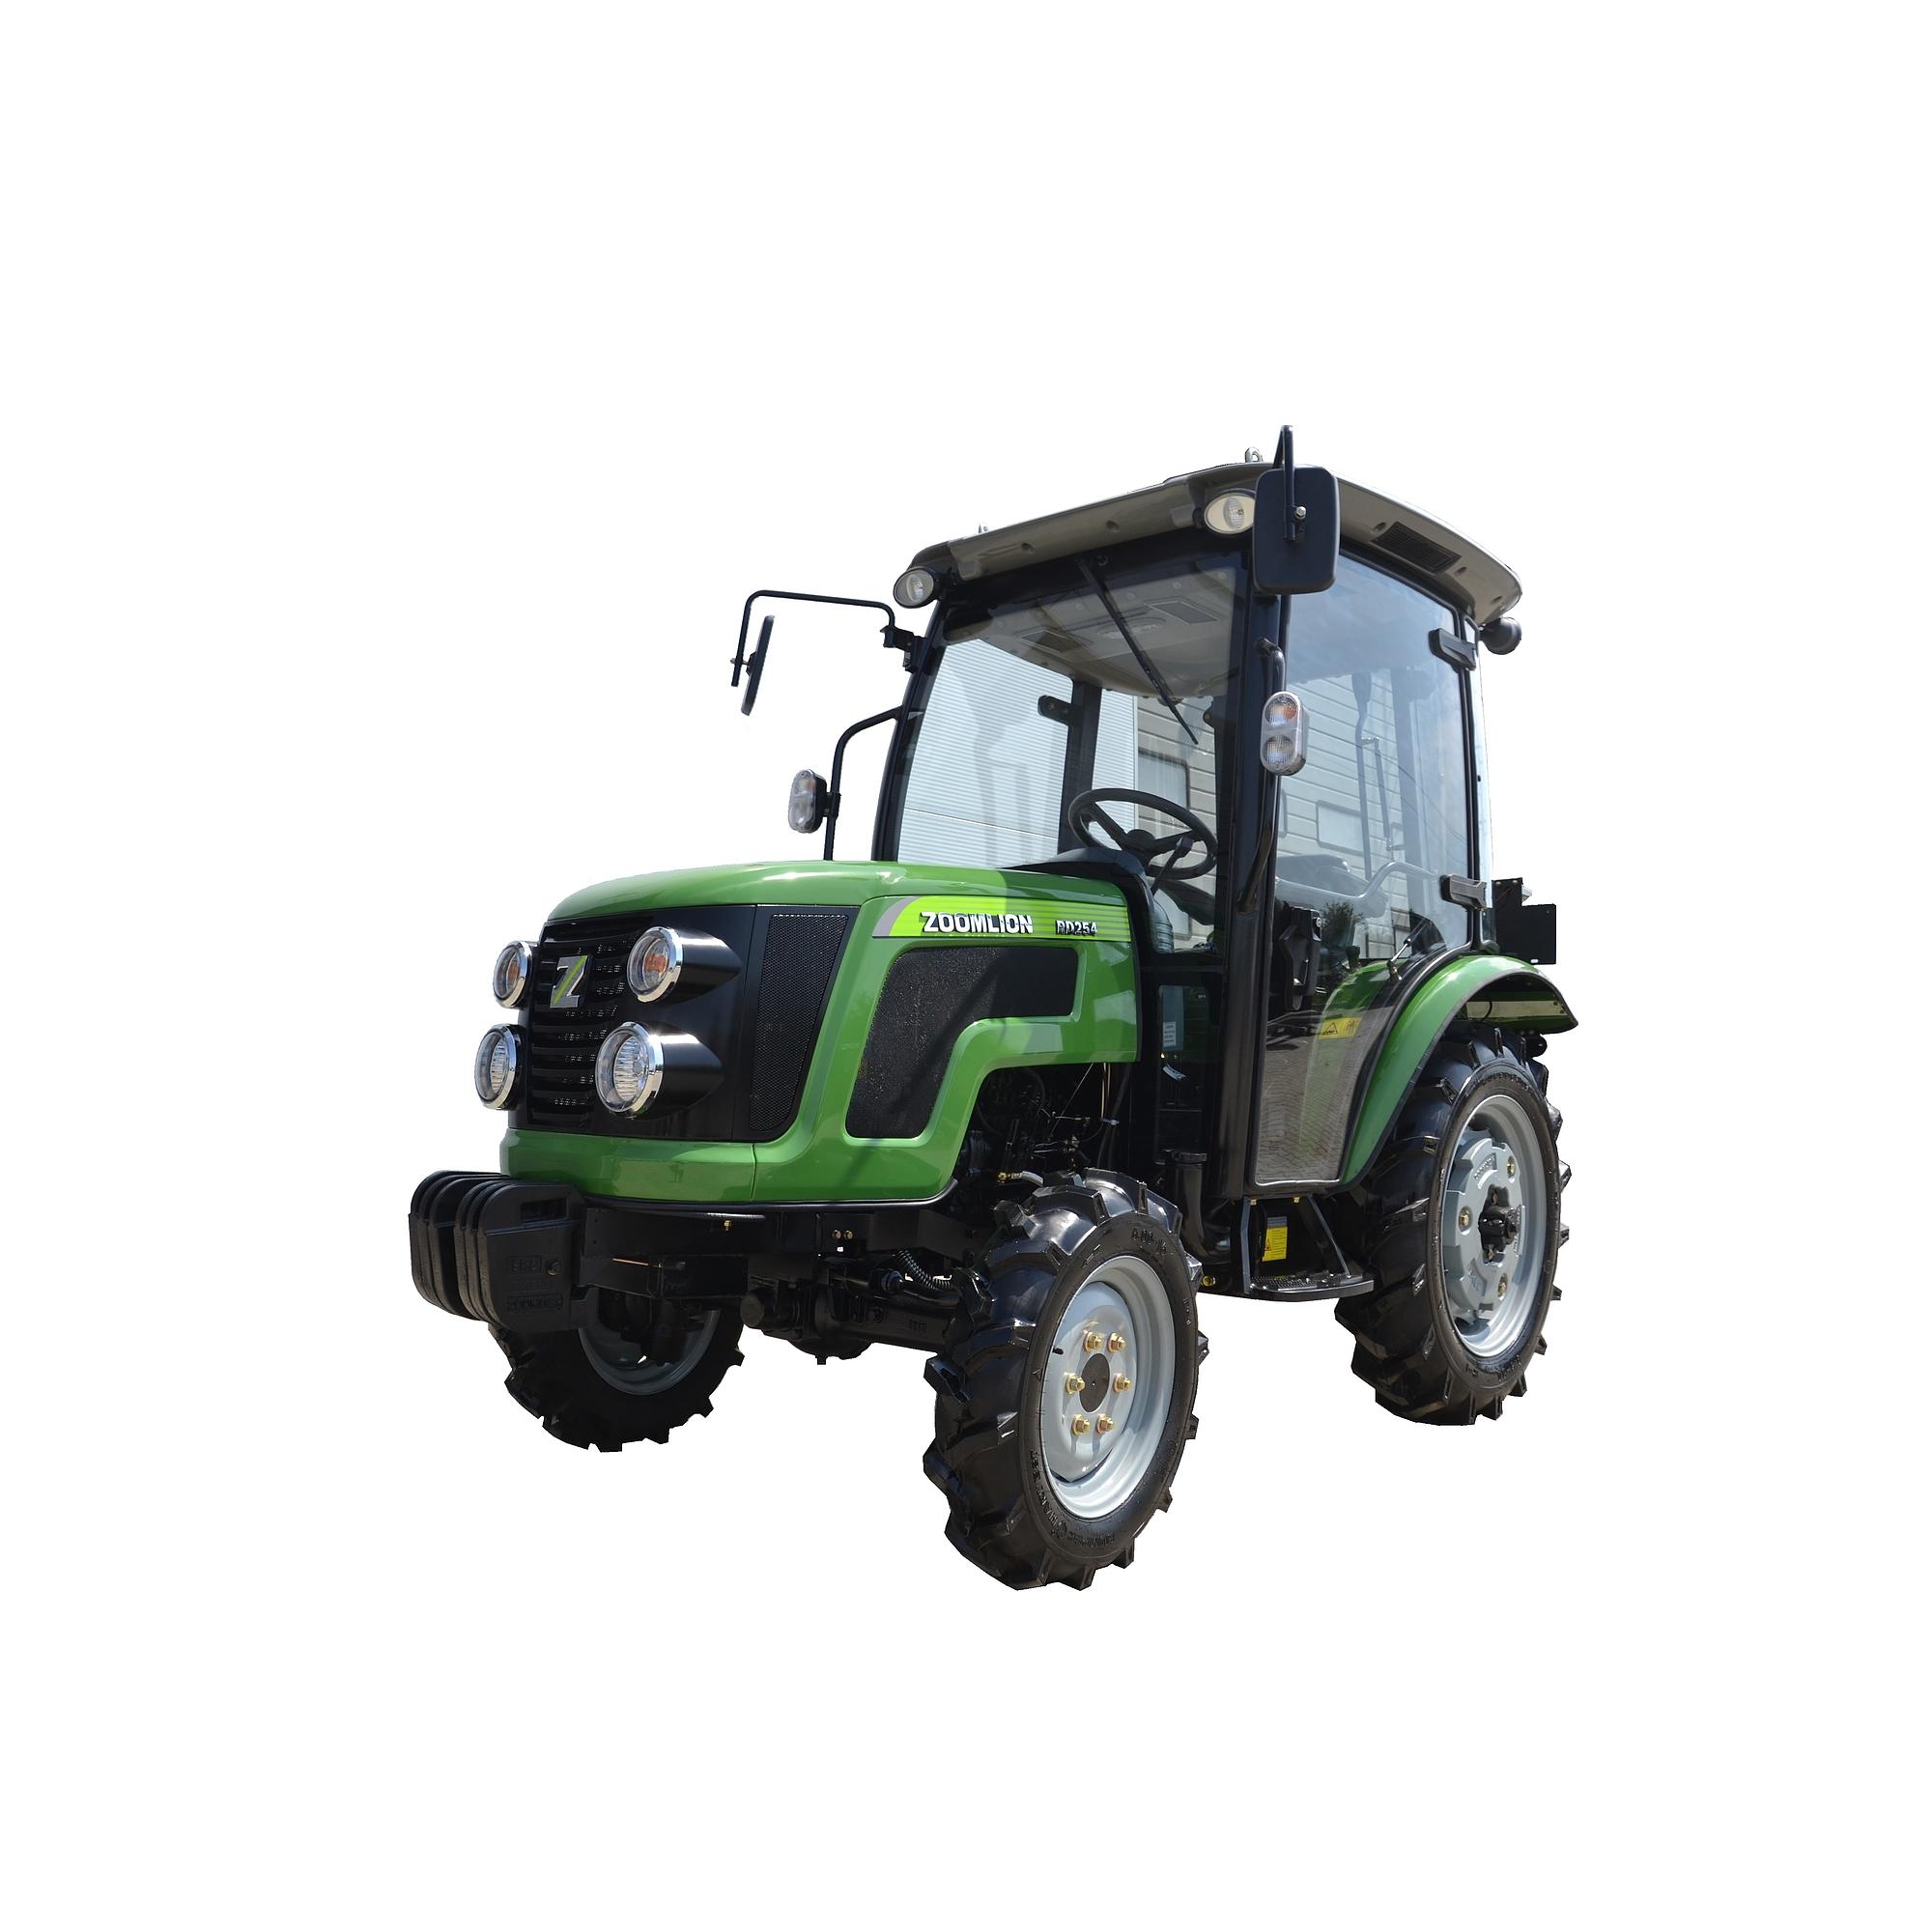 zoomlion-traktor-25-le-fulkes-rd254-1